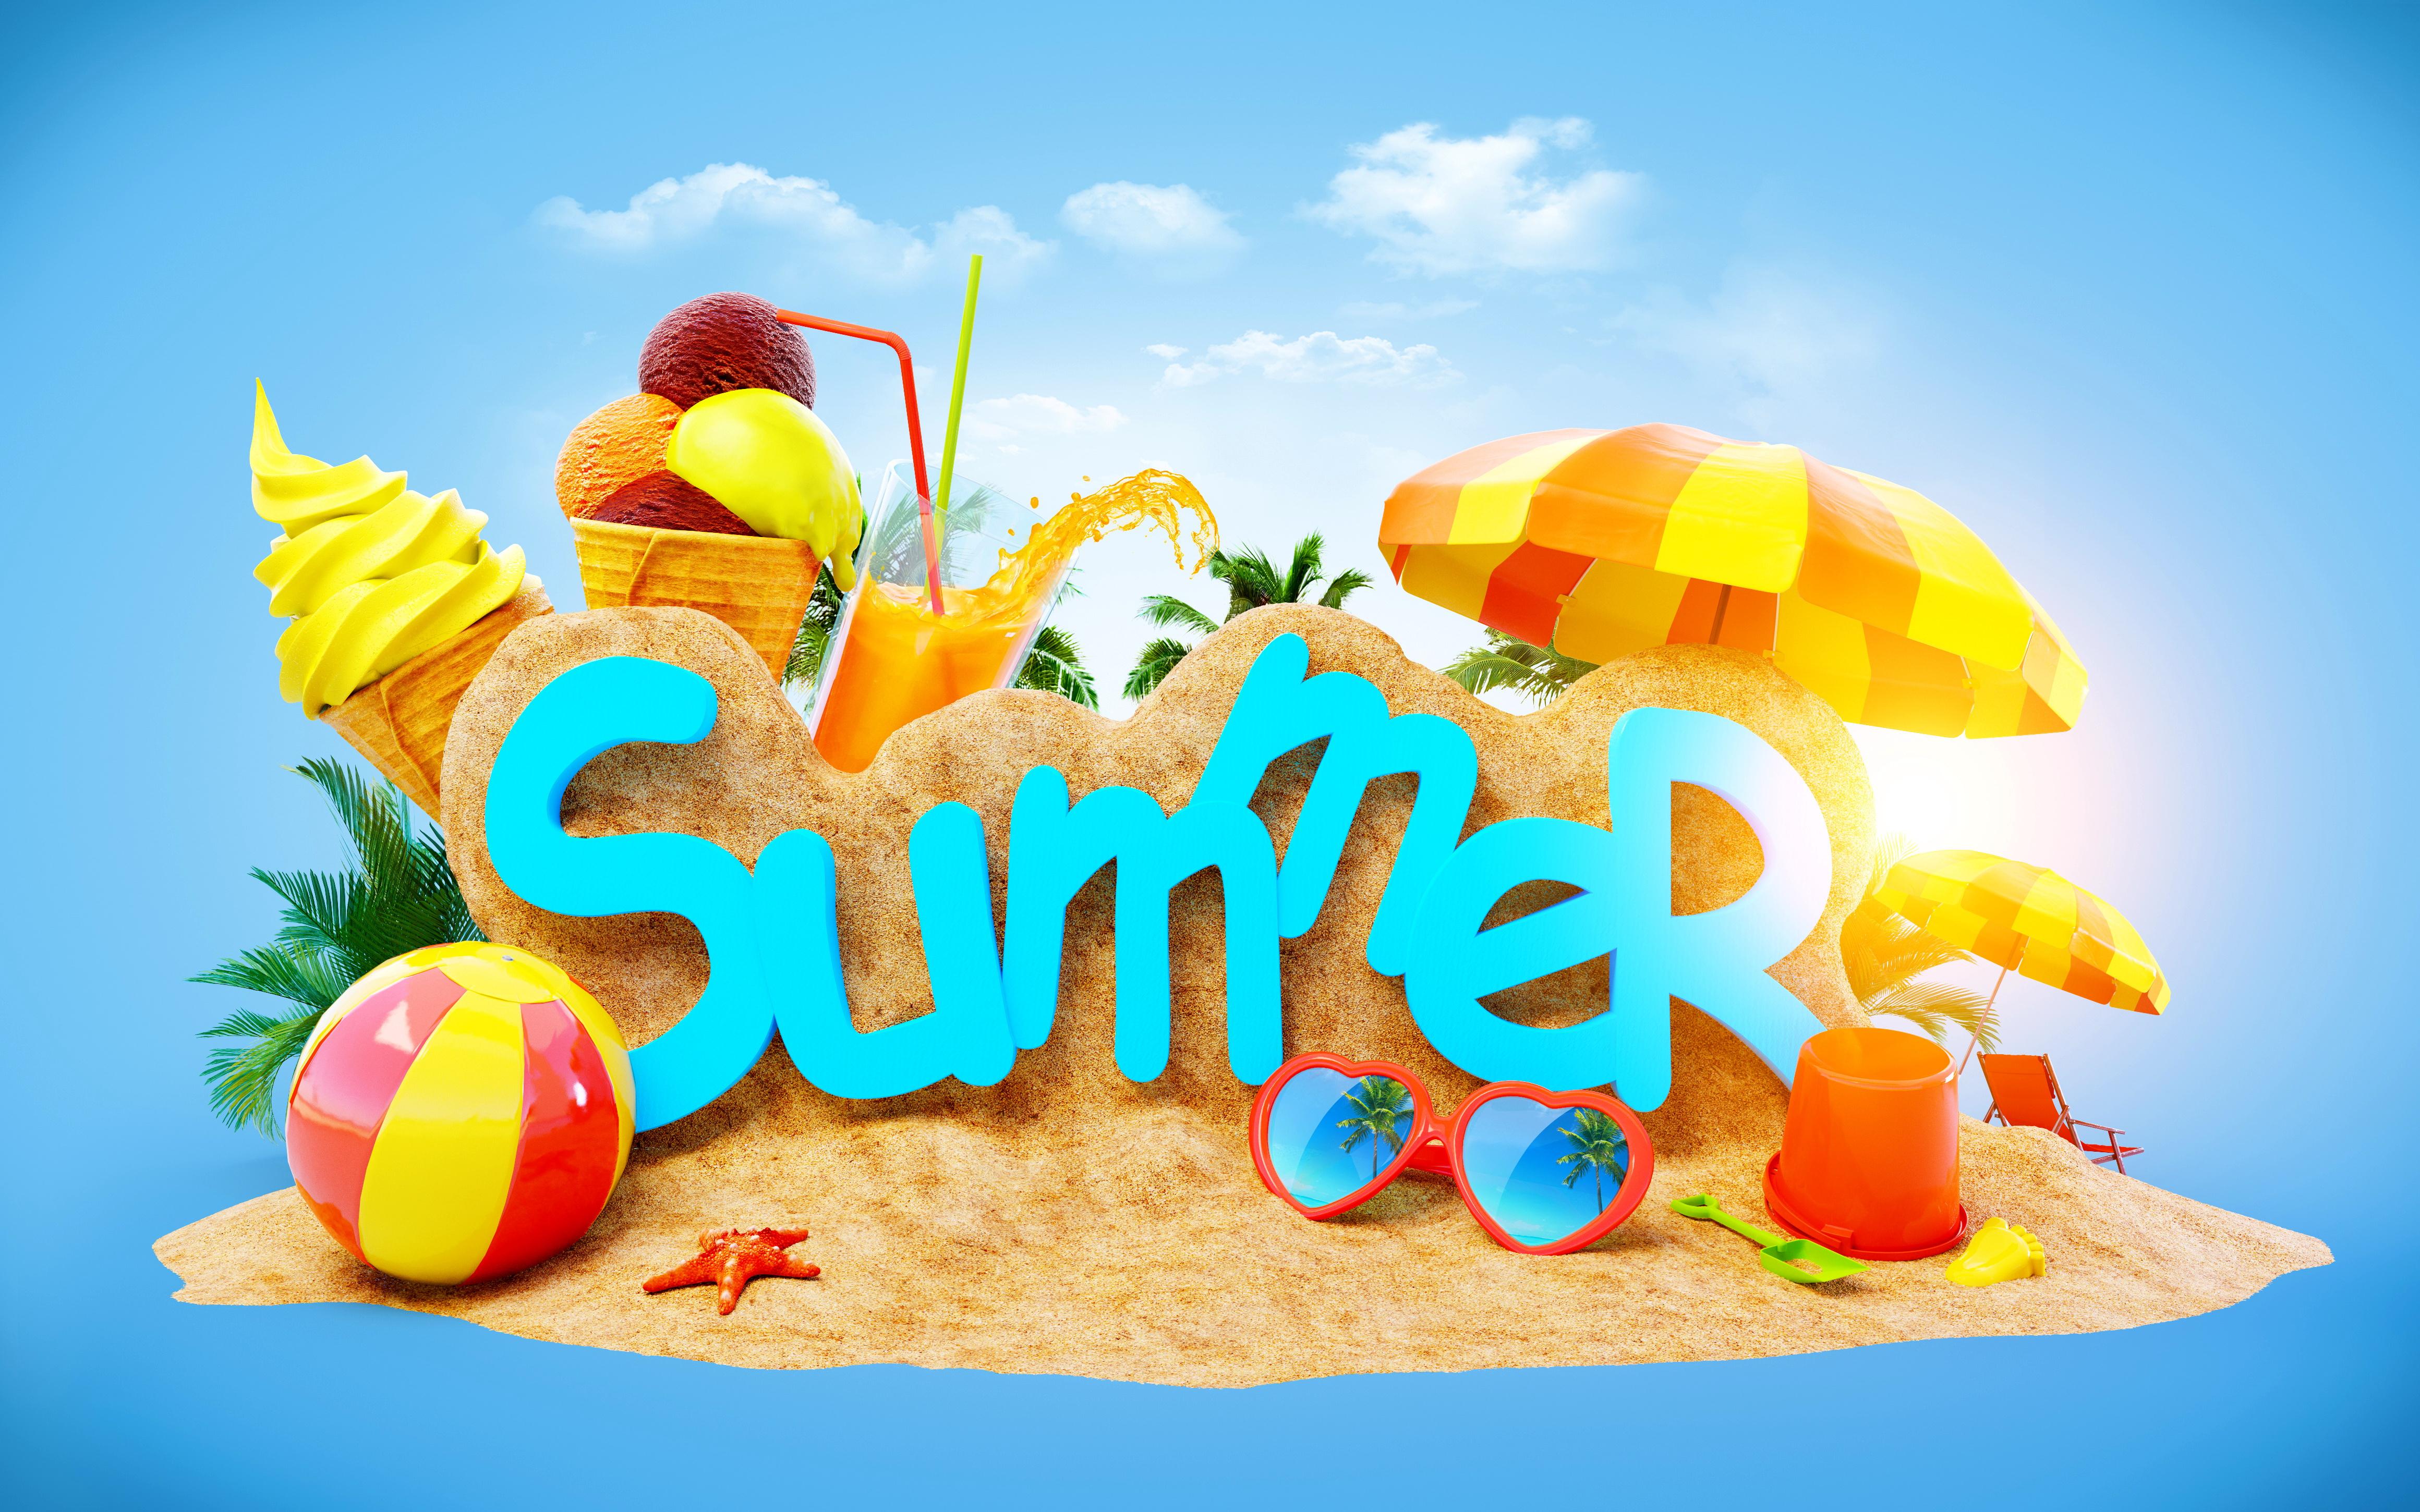 Free Disney Summer Wallpaper: Summer Desktop Backgrounds Wallpapers